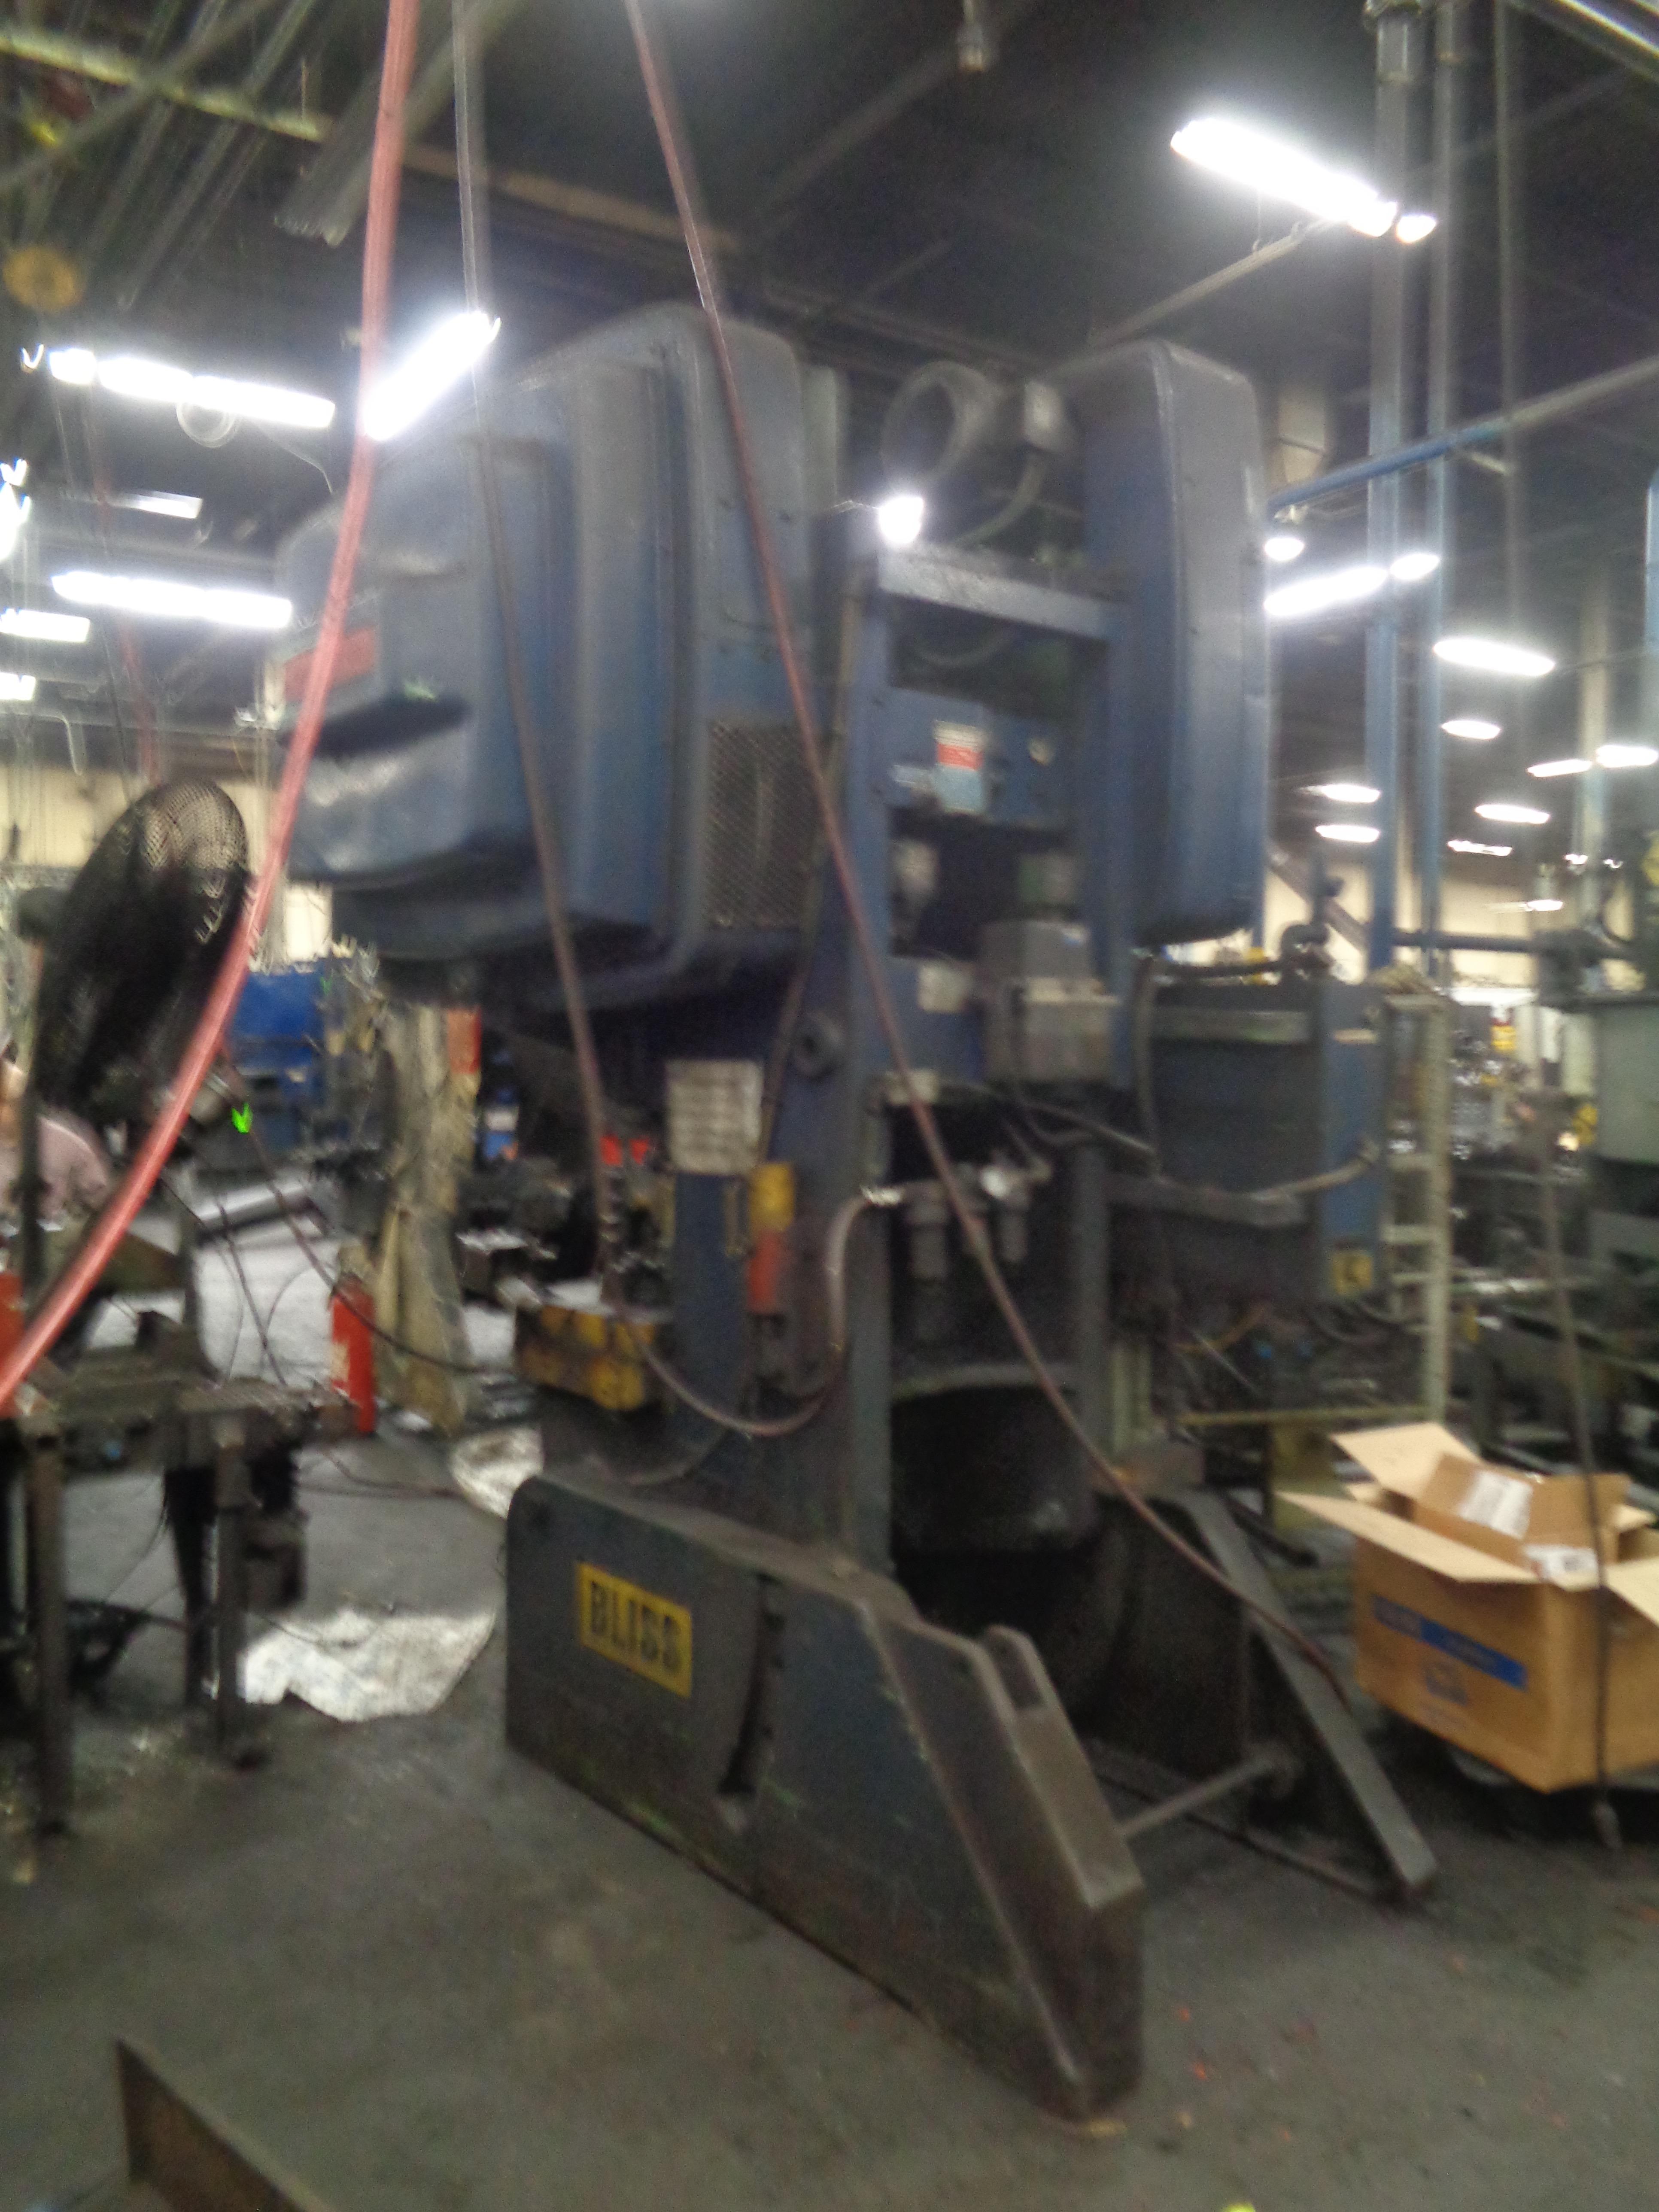 Bliss Press 60 Ton - Located in Swedsboro NJ - Image 3 of 4